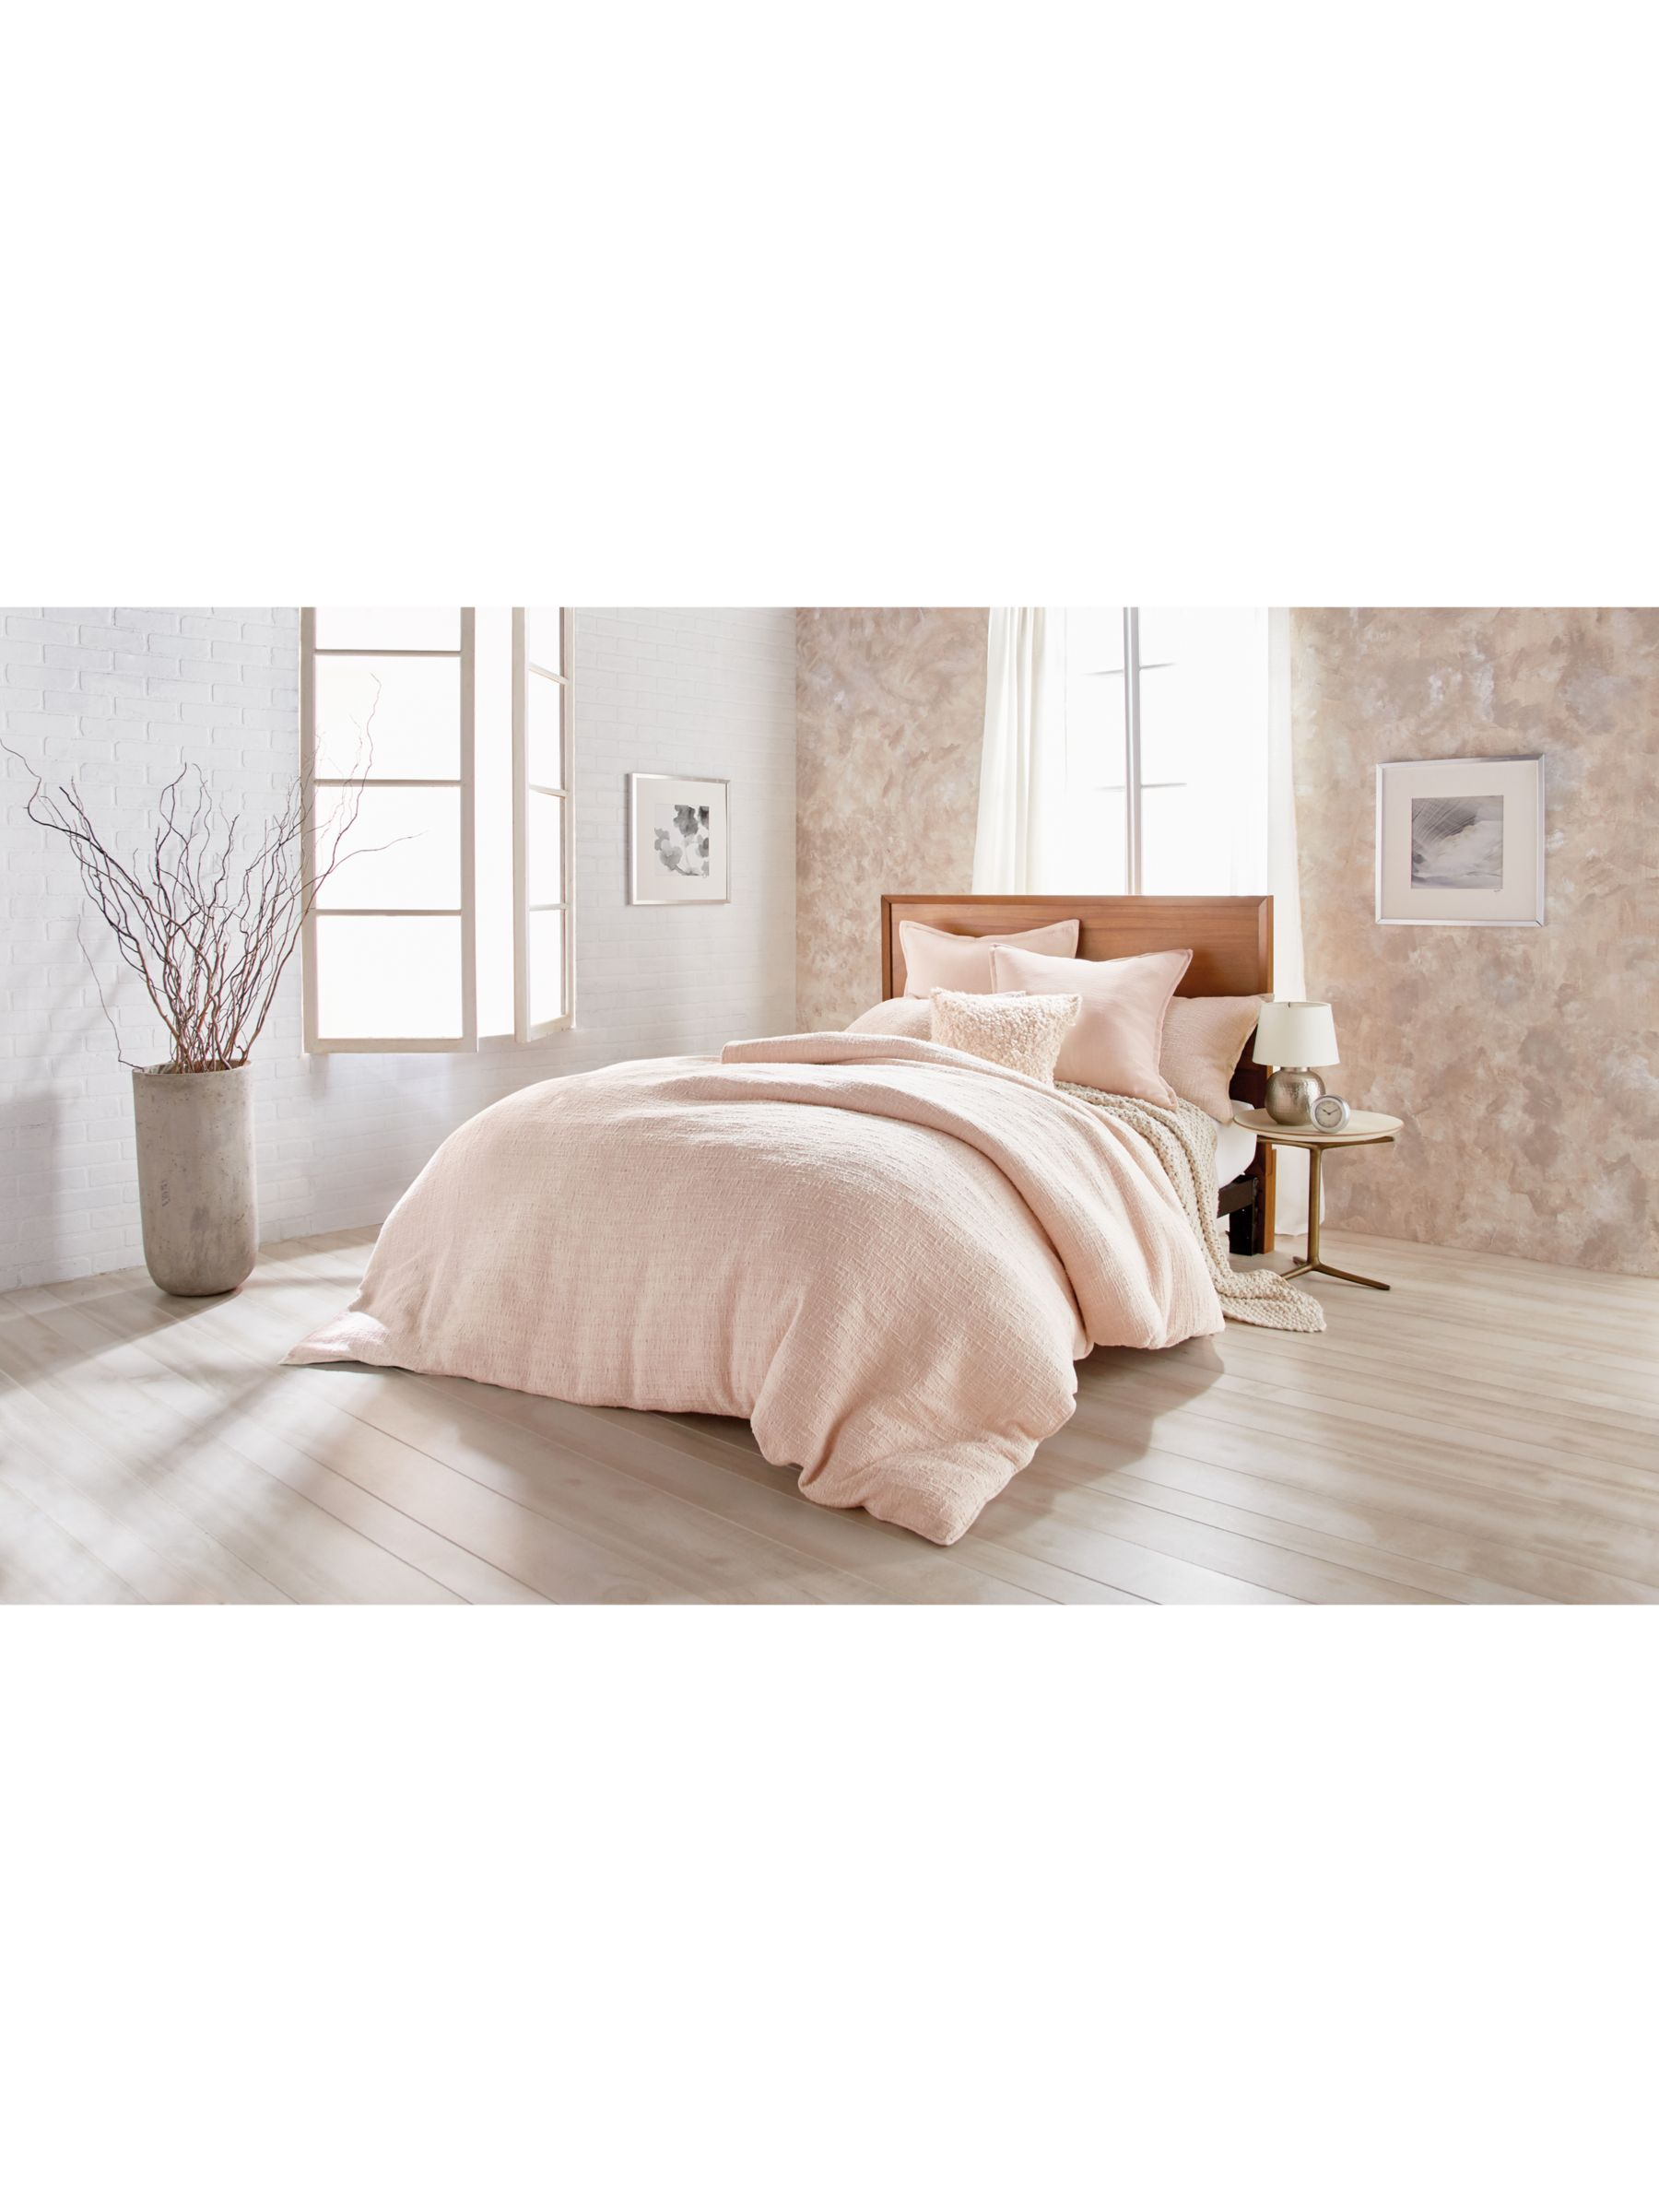 Dkny Texture Blush Bedding At John Lewis Partners